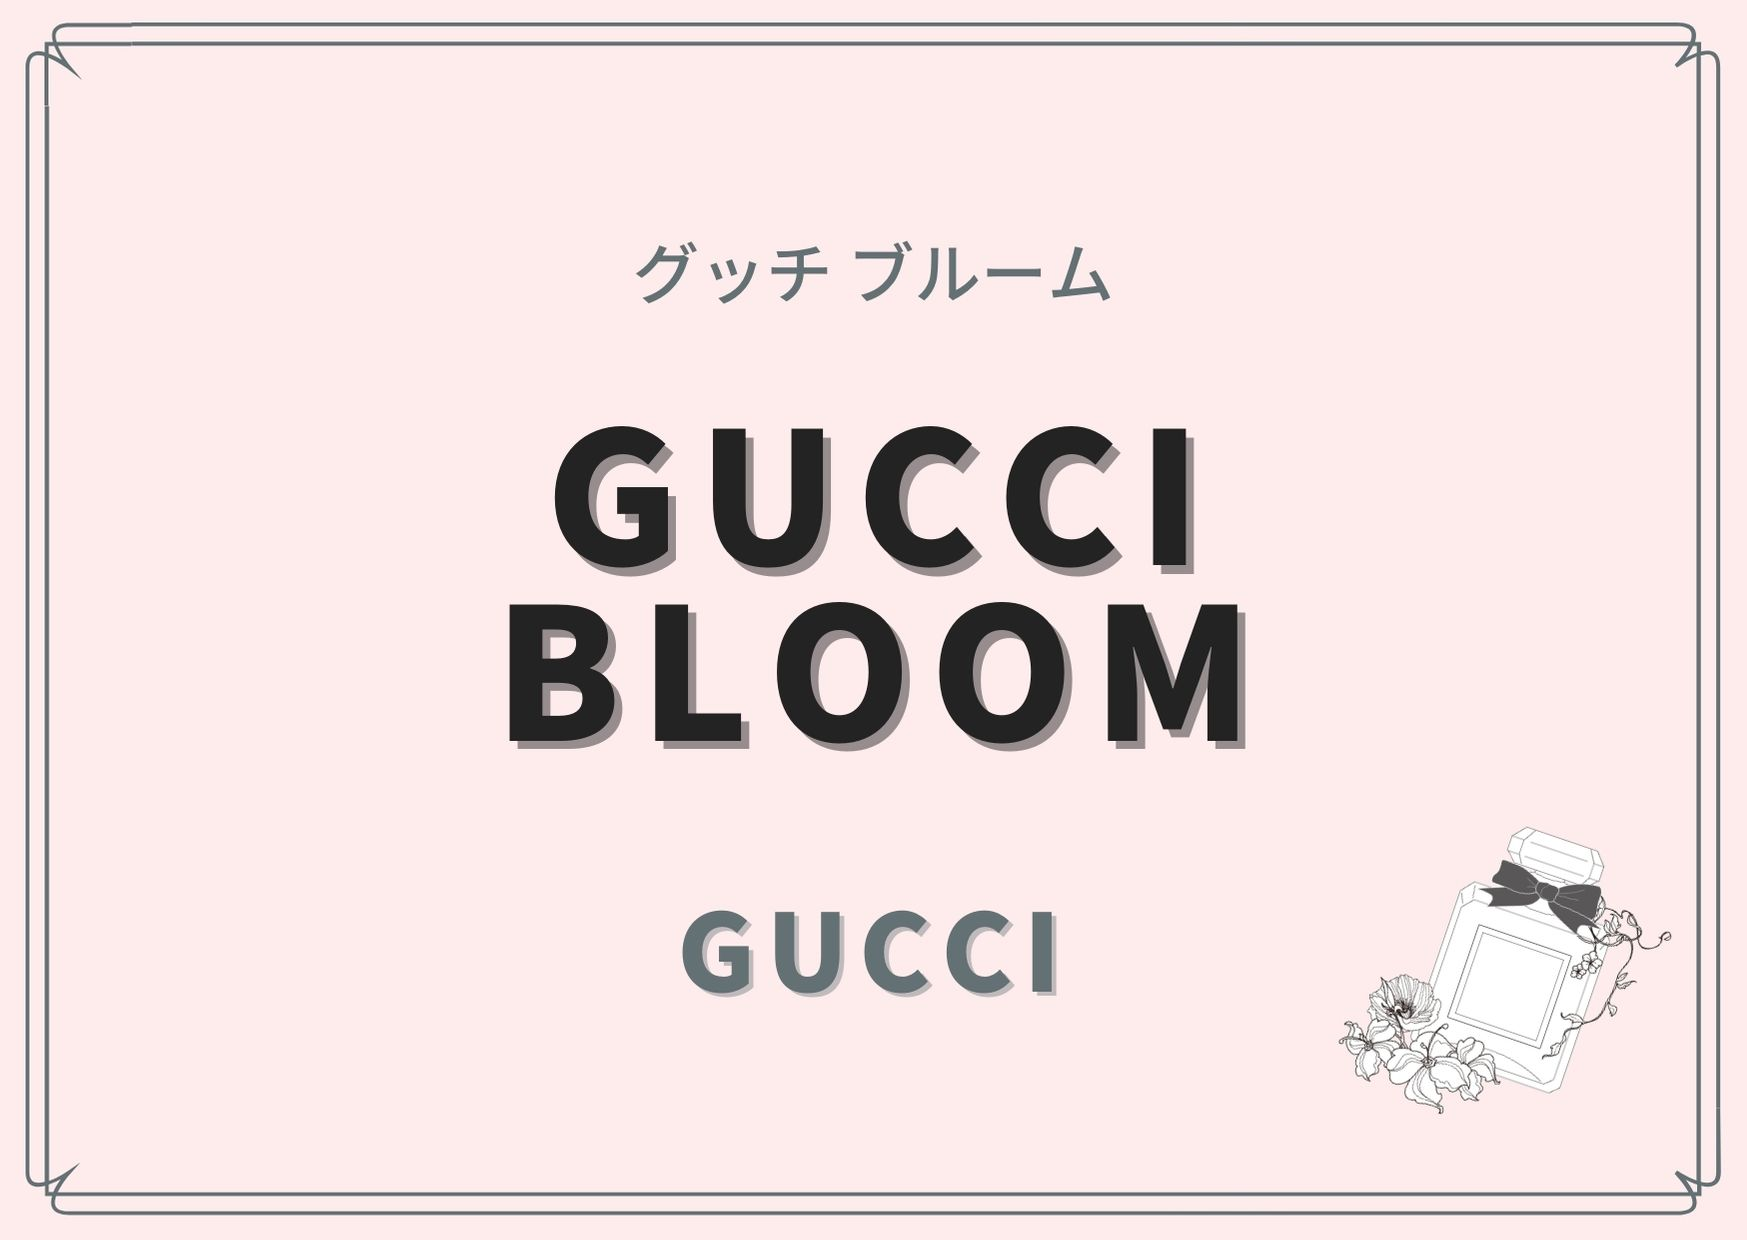 GUCCI BLOOM(グッチ ブルーム)/GUCCI(グッチ)